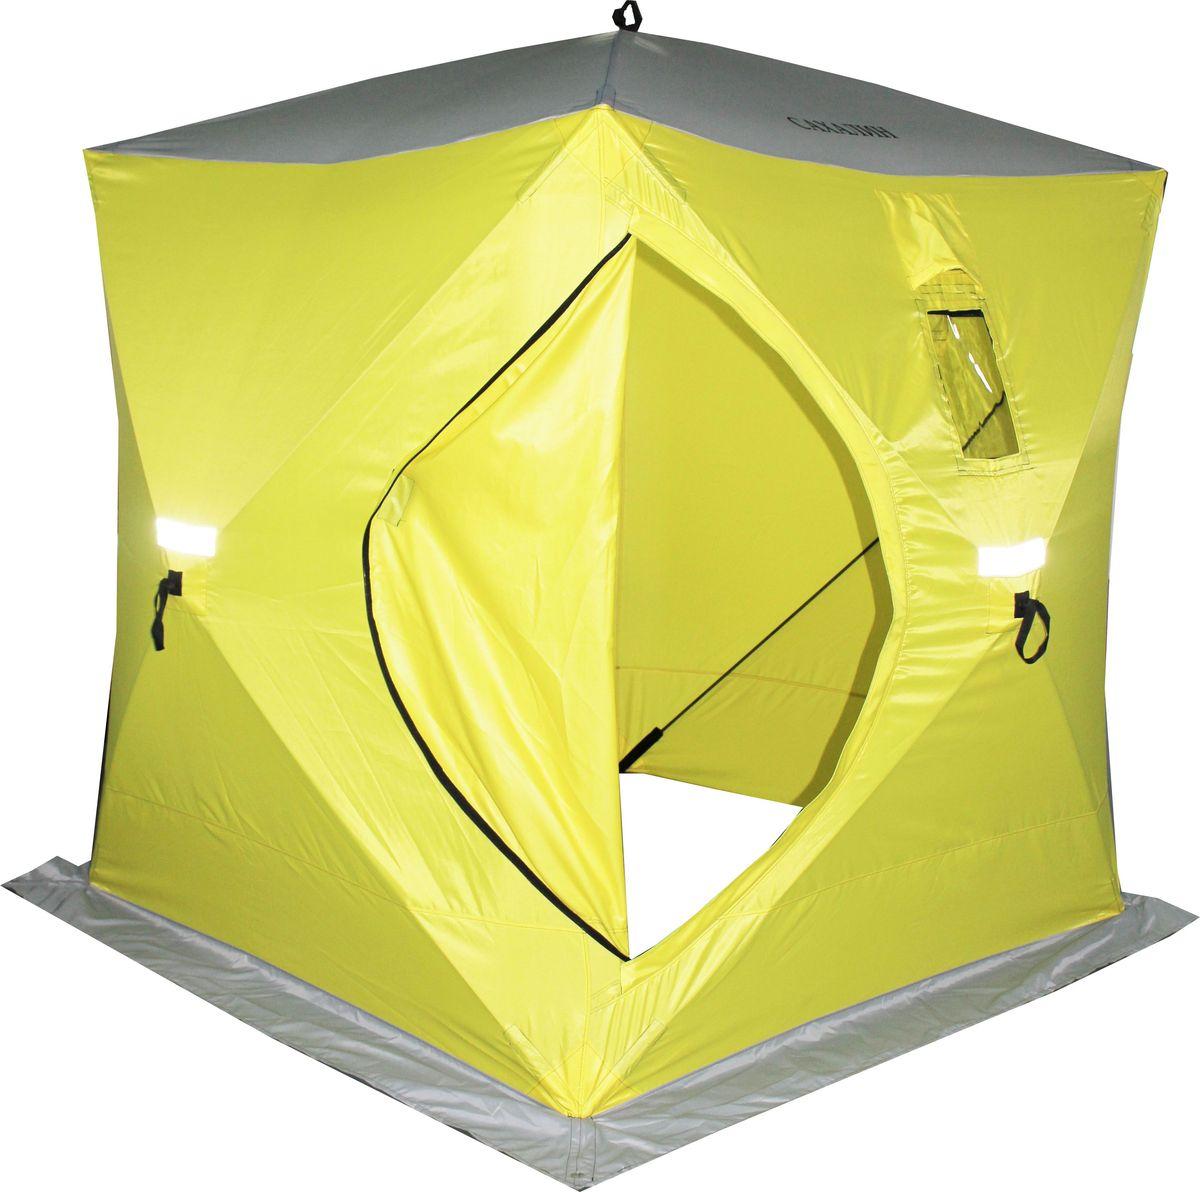 Палатка зимняя Prival Сахалин, 2-местная, цвет: желтый, серый, 150 х 150 х 170 см зимняя палатка медведь 4 купить